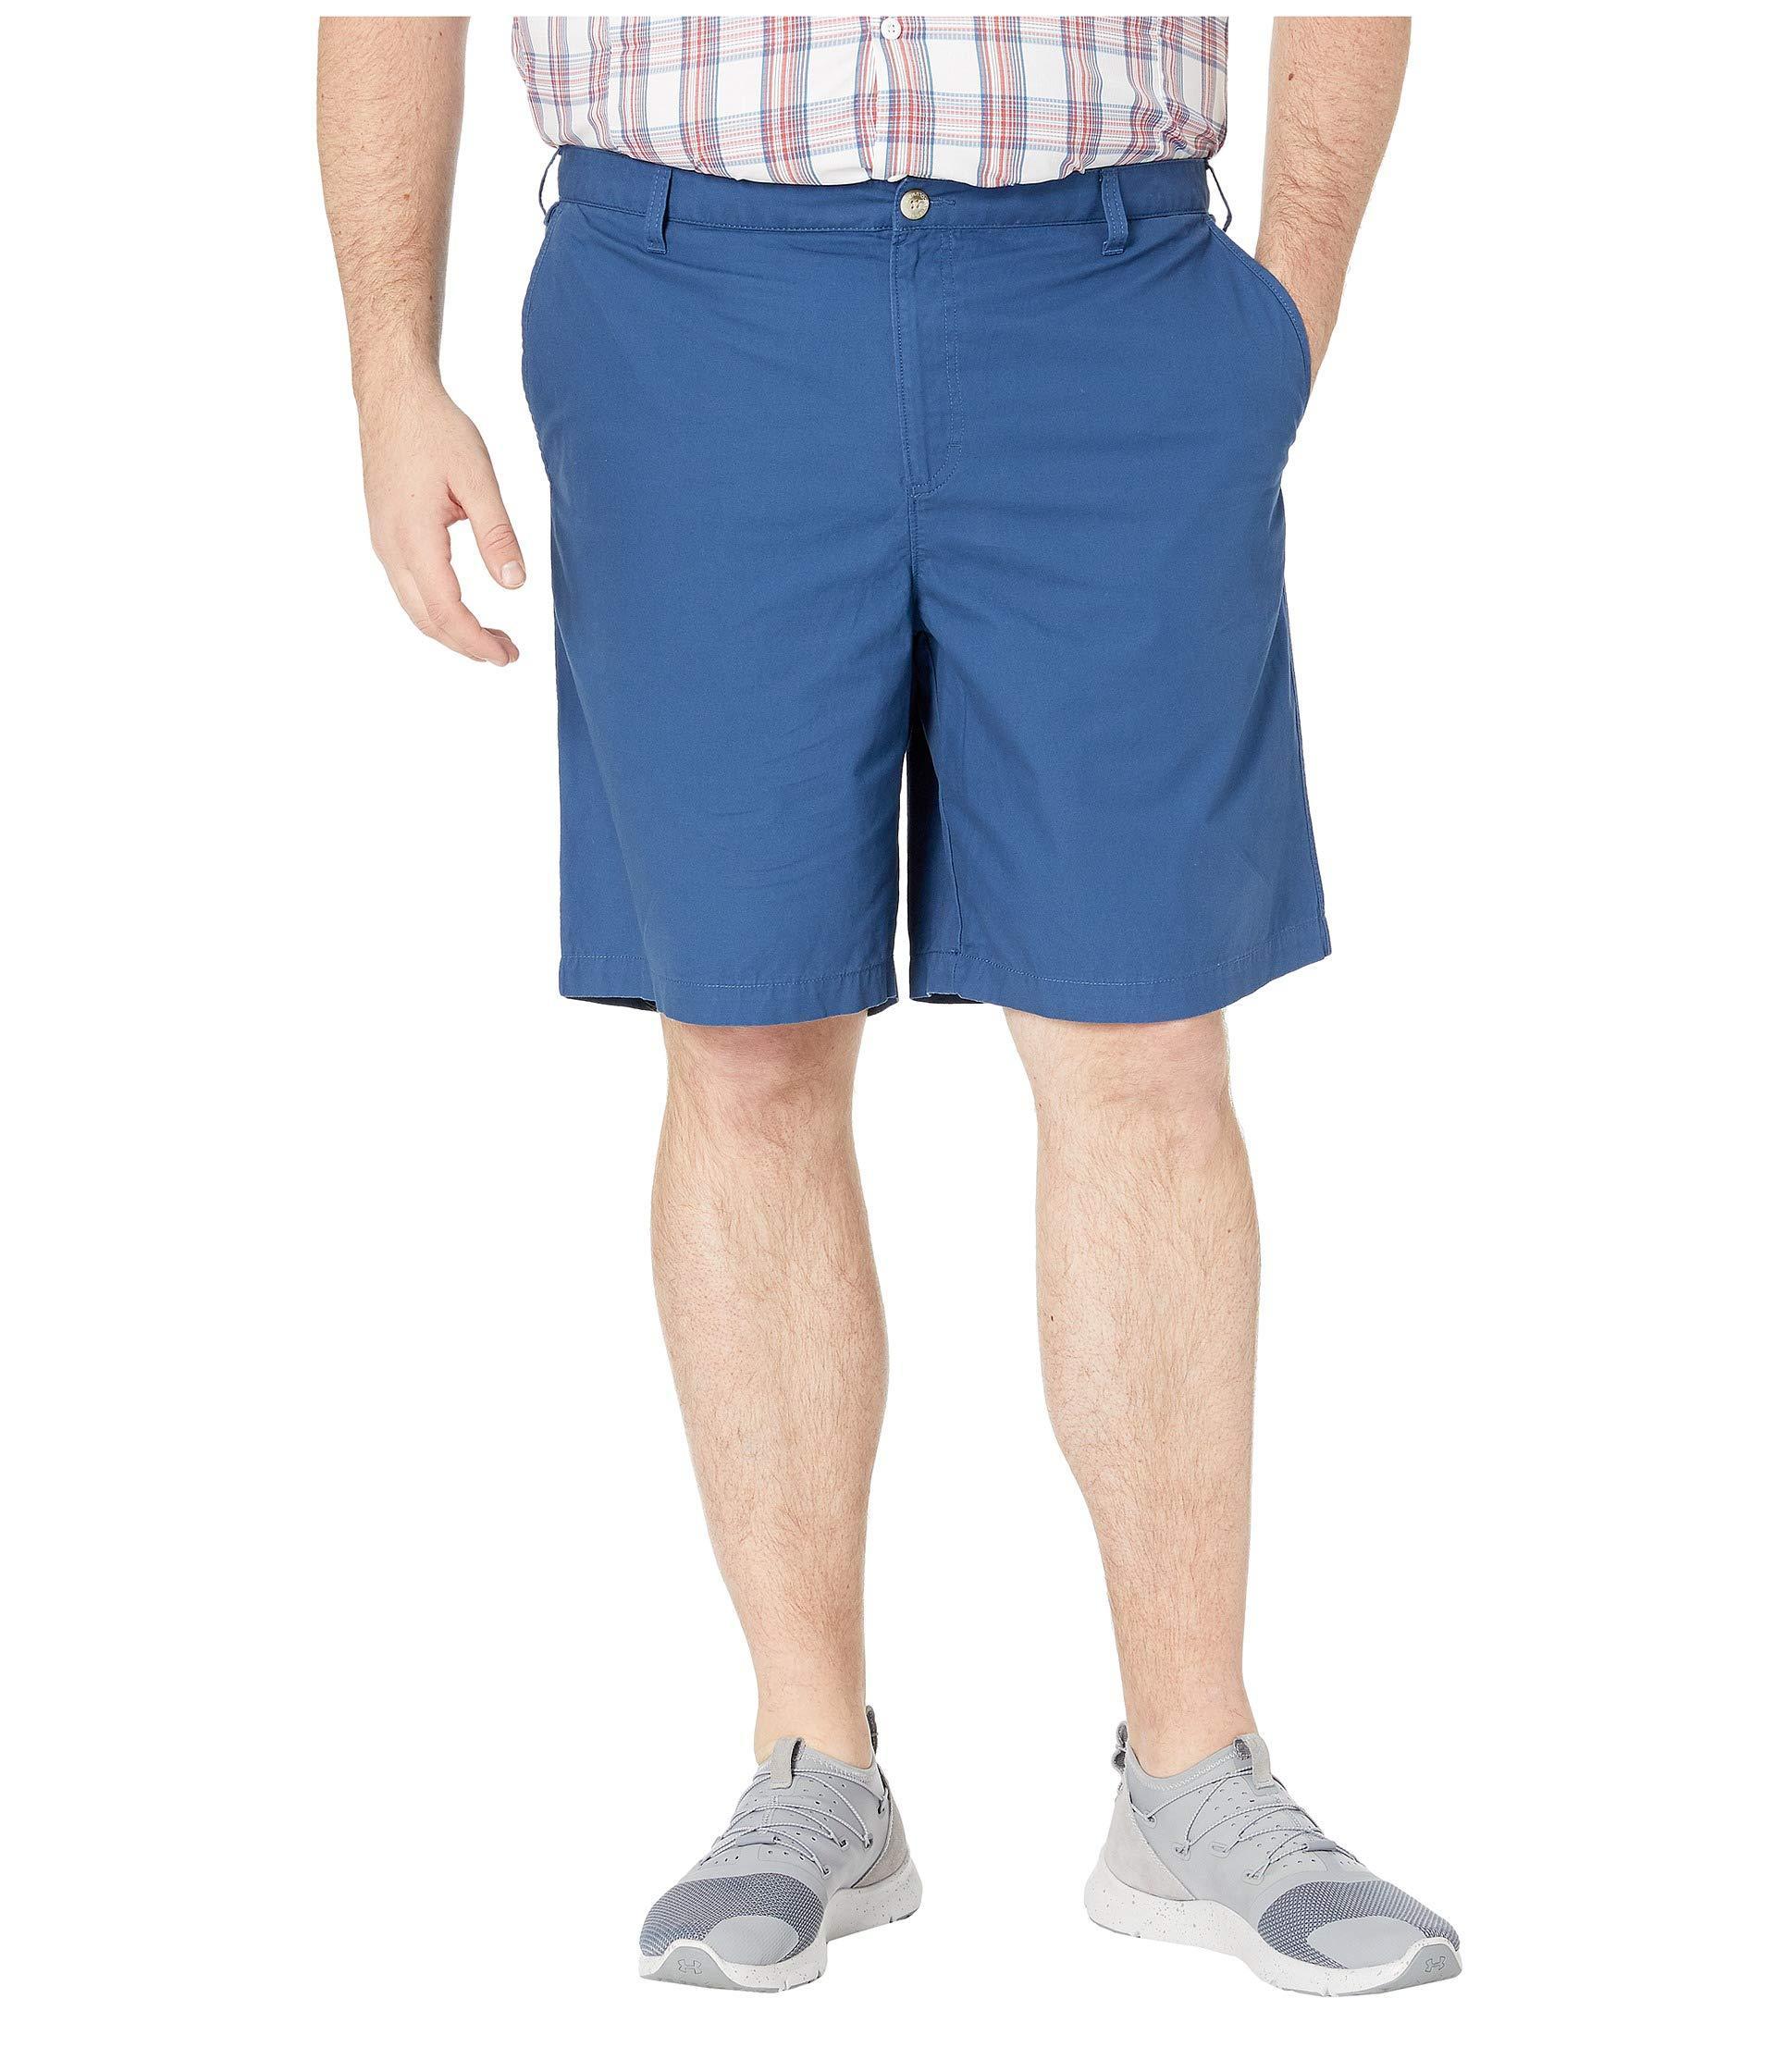 acedd703700 Mens Dress Shorts Big And Tall